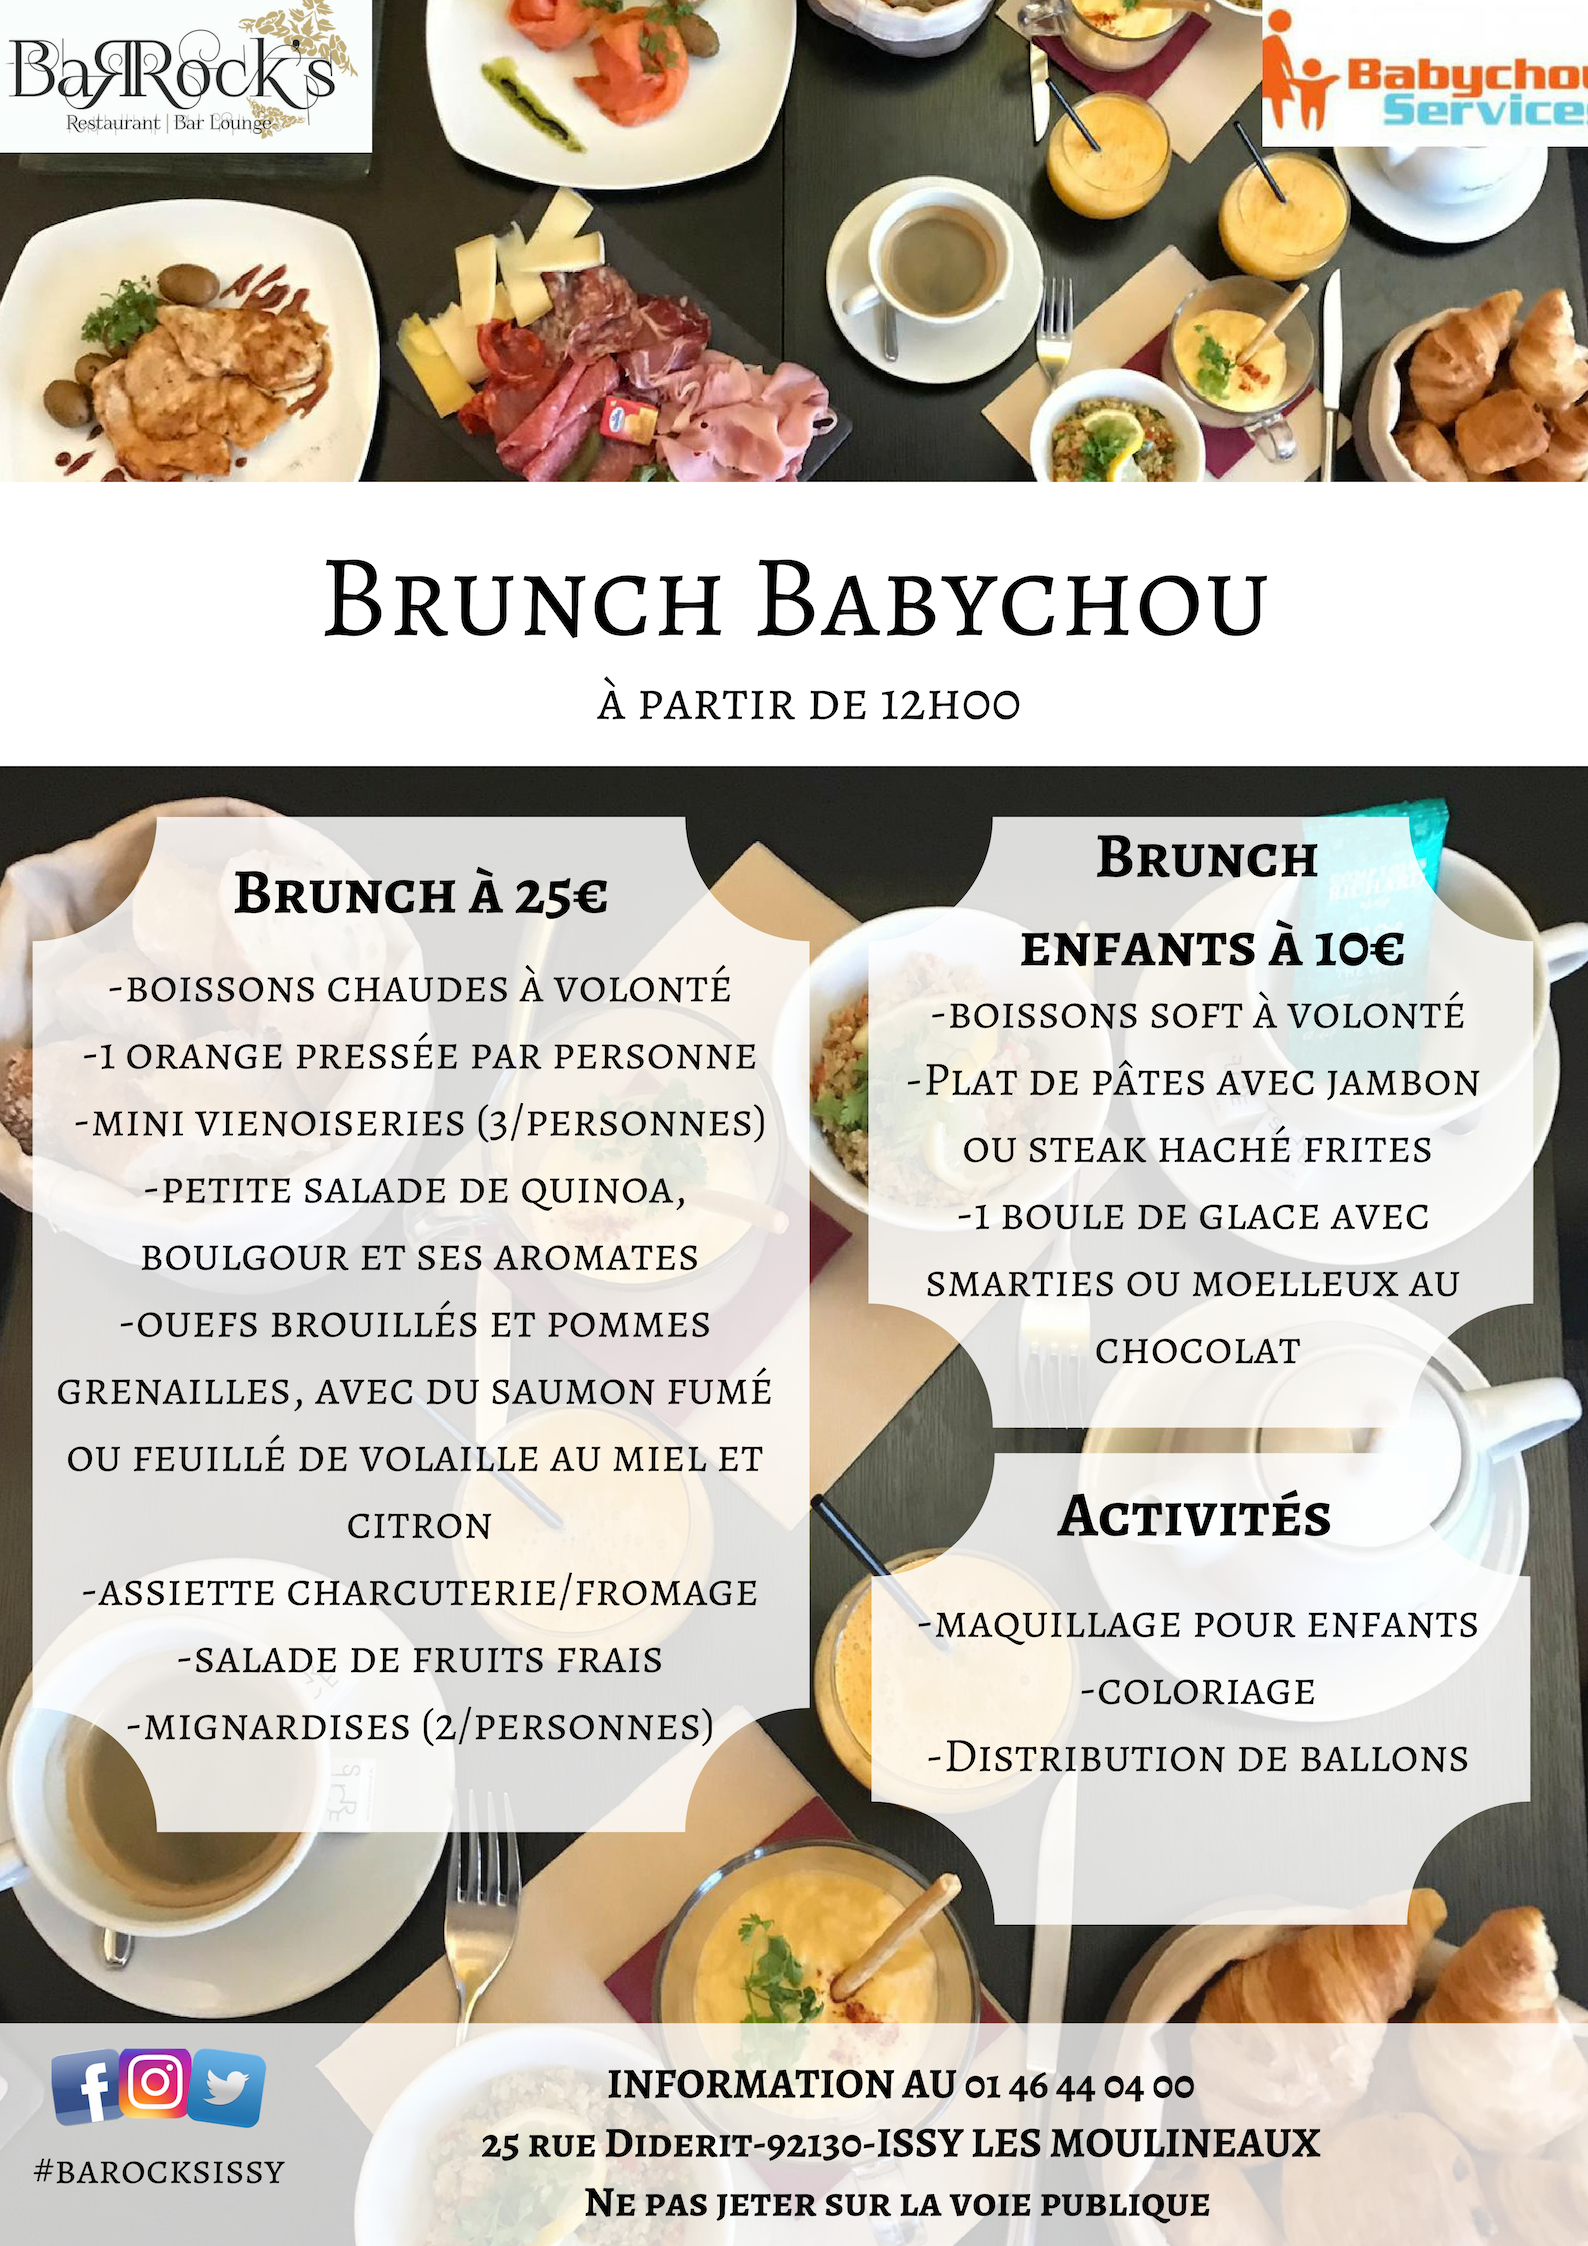 Brunch Babychou au Barock's